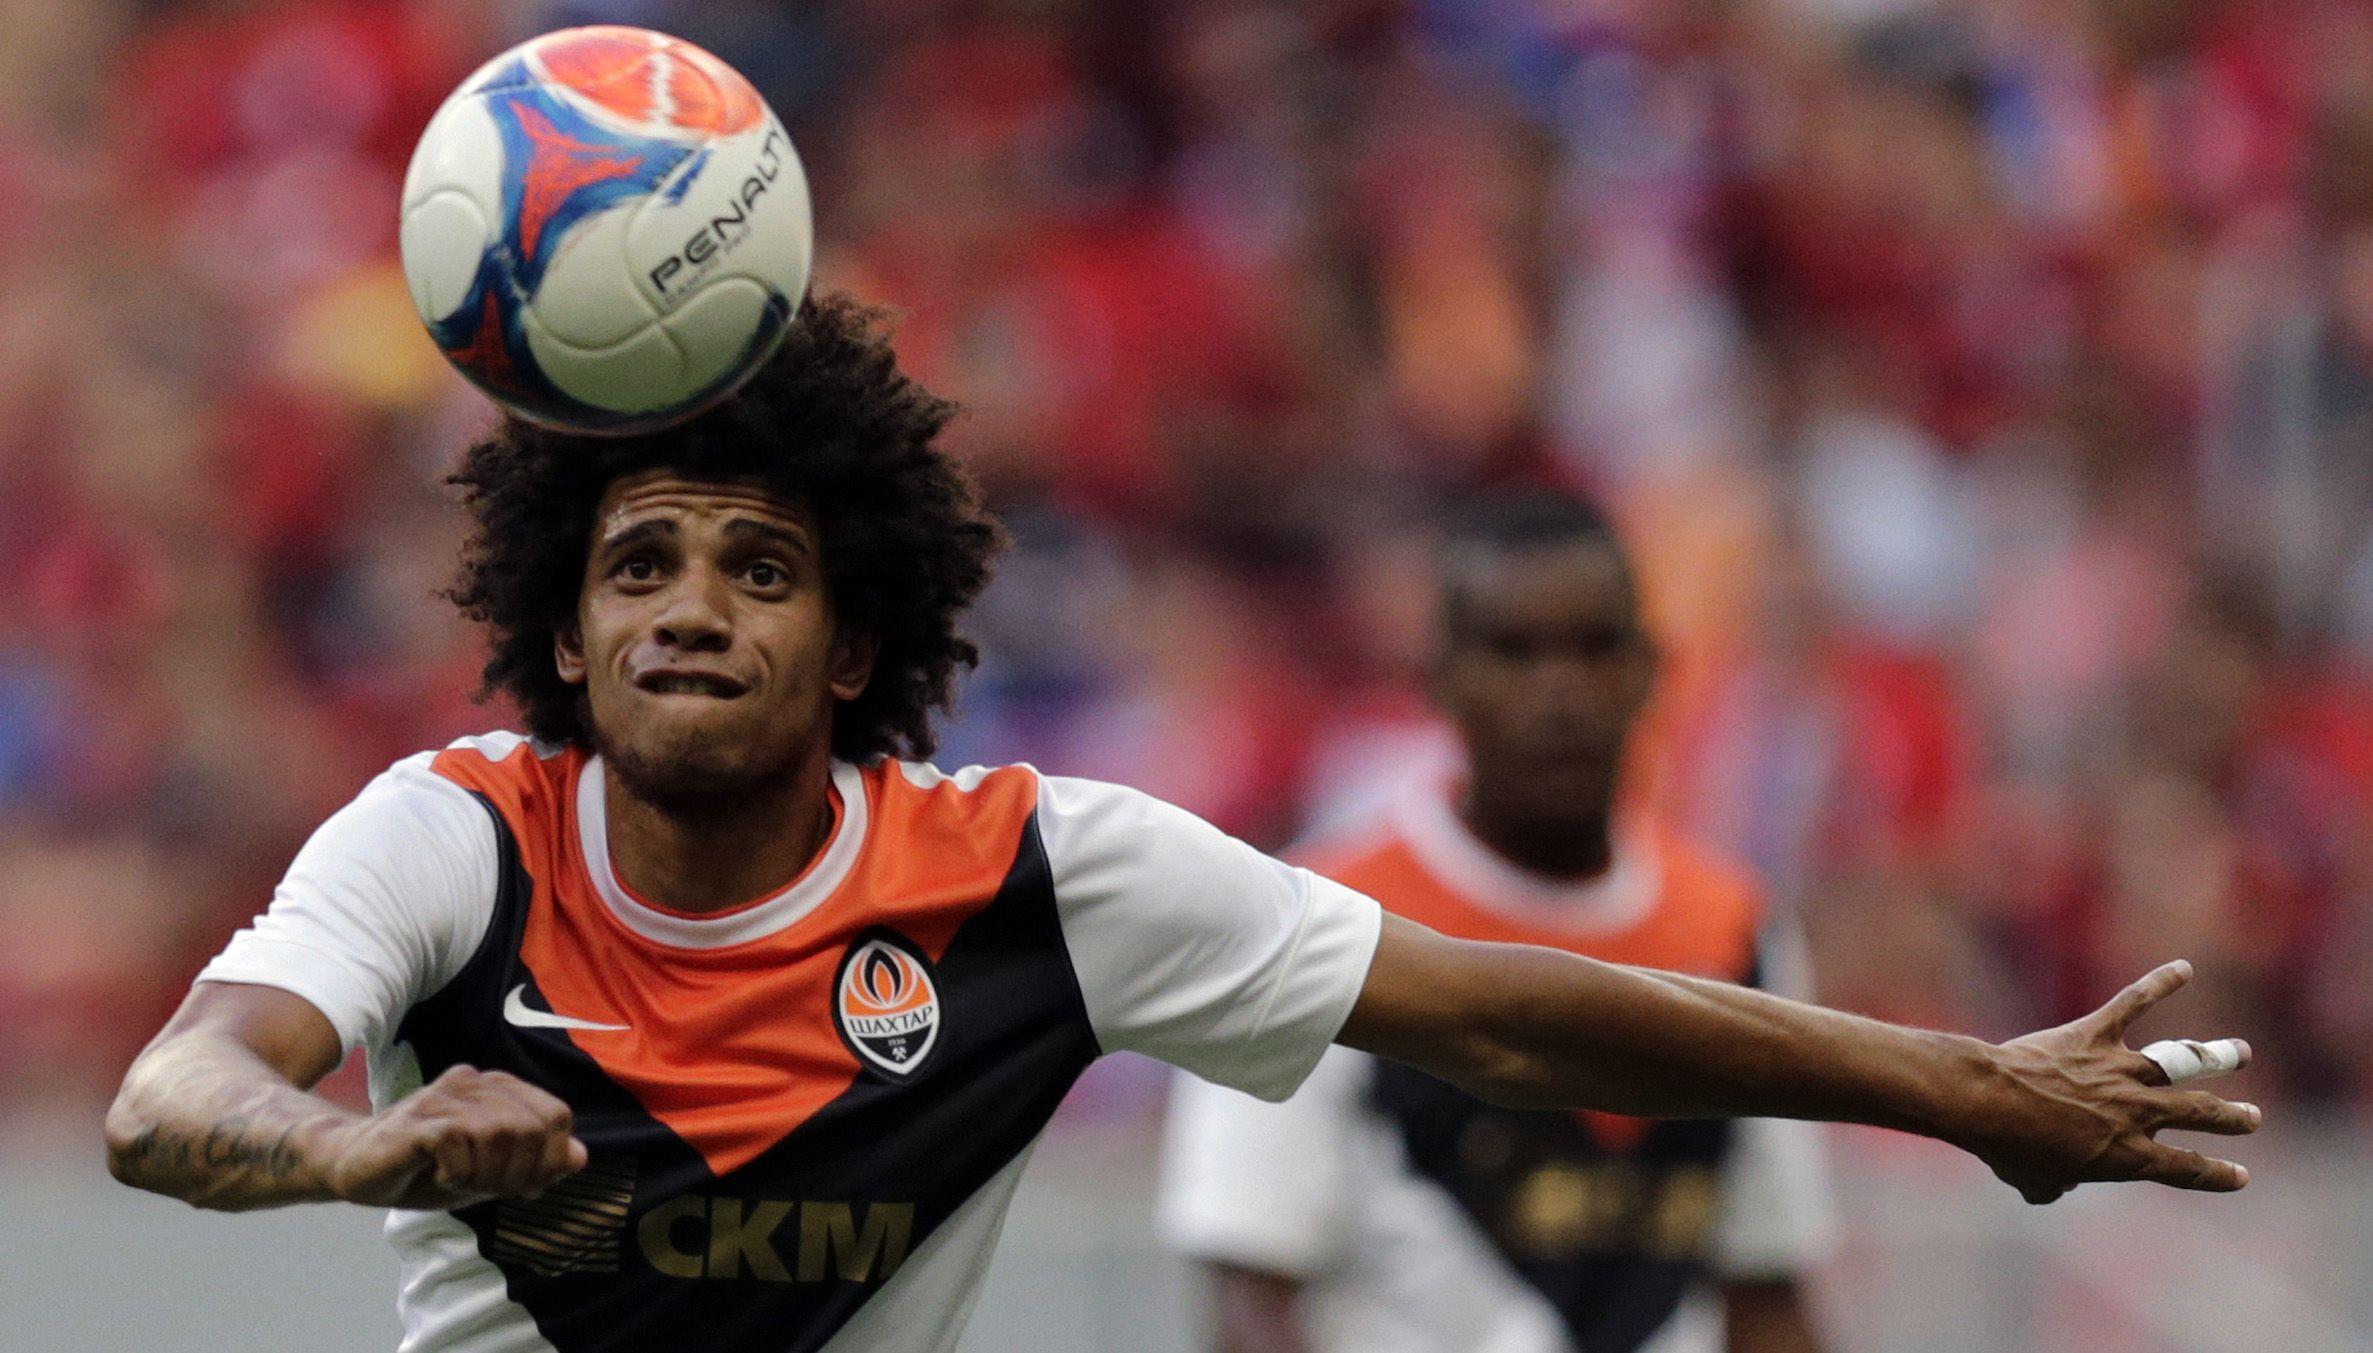 Shaktar Donetsk's Tyson control the ball during their Granada Cup soccer match against Flamengo at Mane Garrincha  national stadium in Brasilia January 18, 2015. REUTERS/Ueslei Marcelino (BRAZIL - Tags: SPORT SOCCER) - RTR4LWZ4